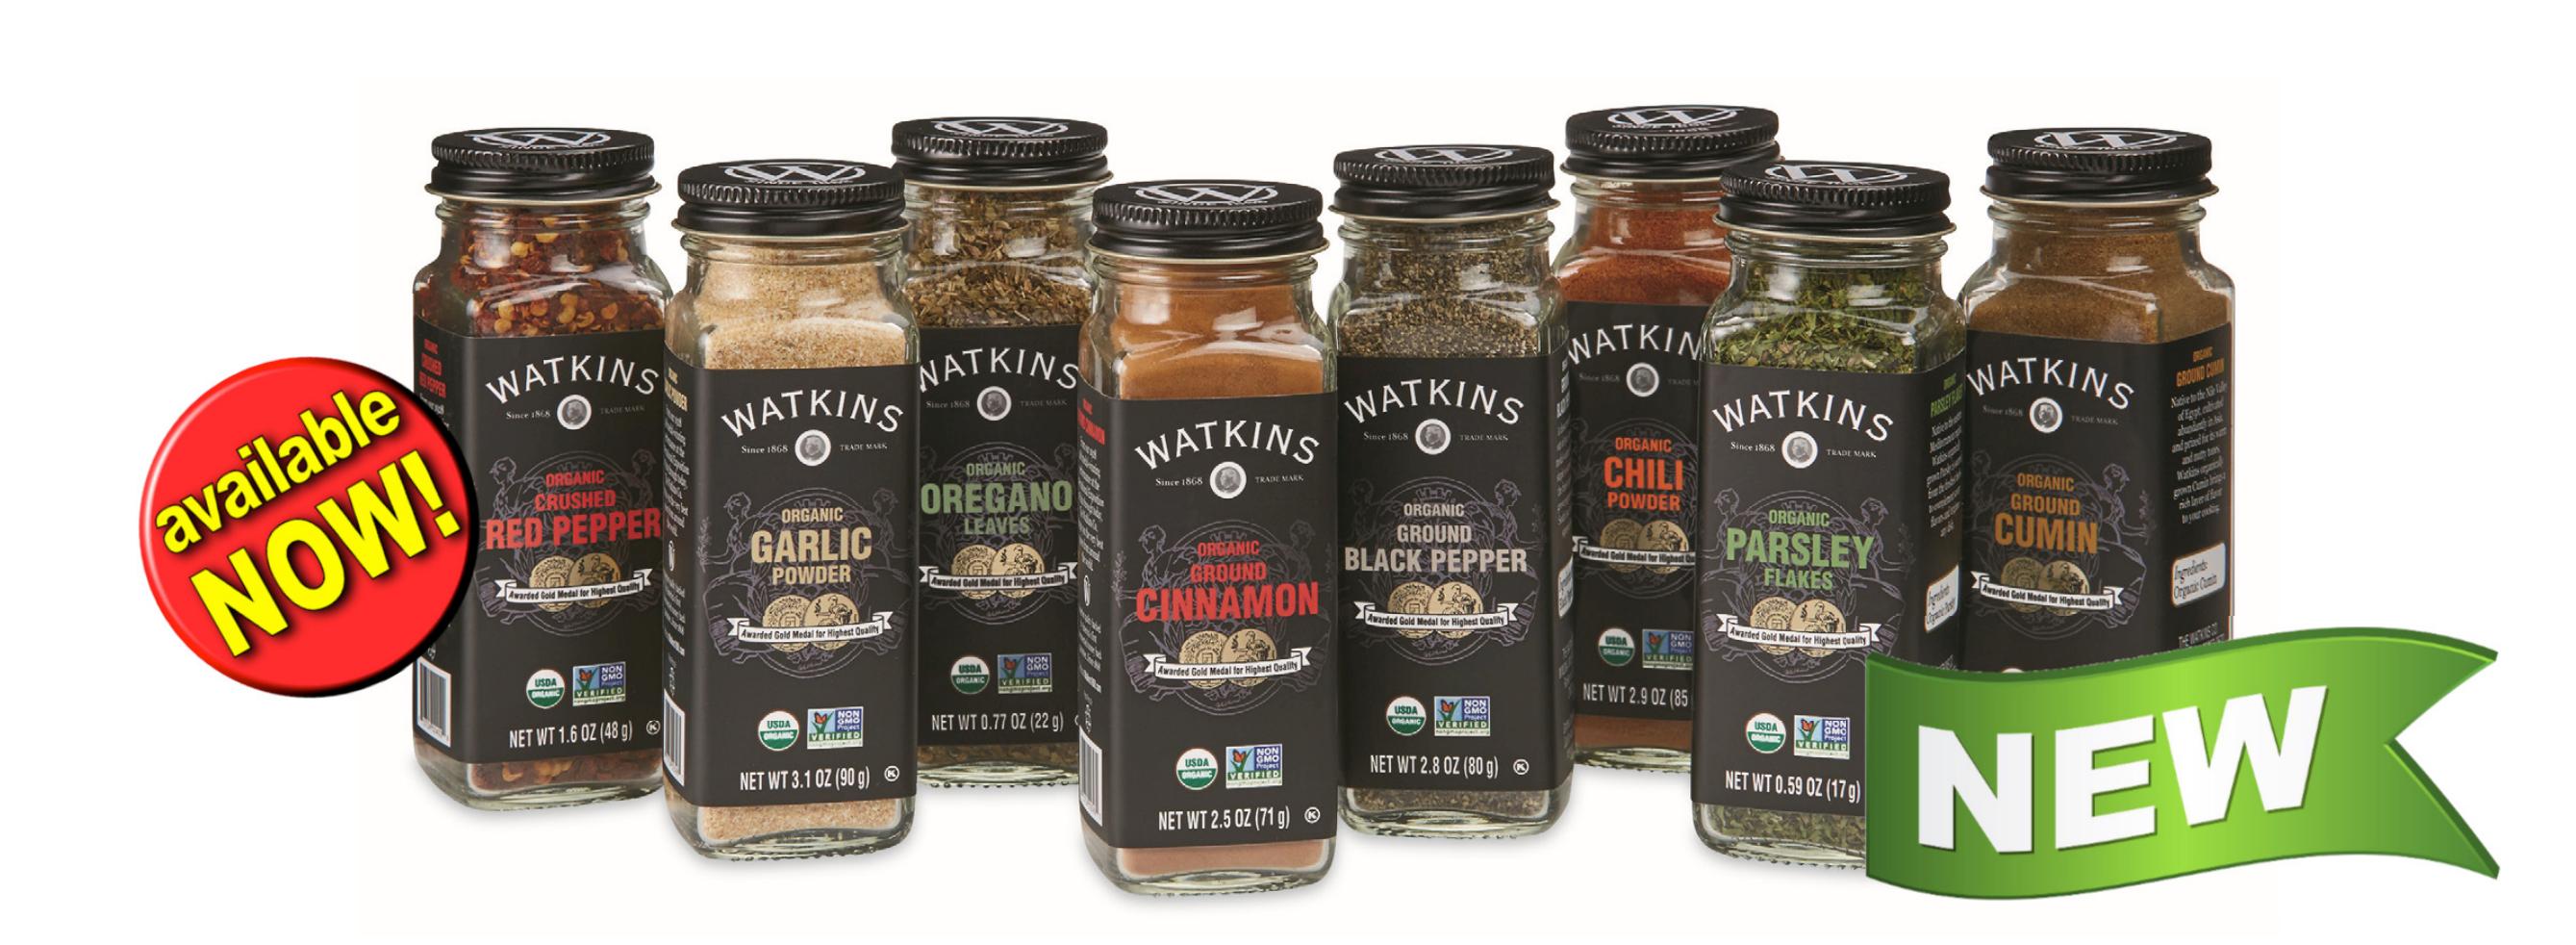 Watkins new organic spices